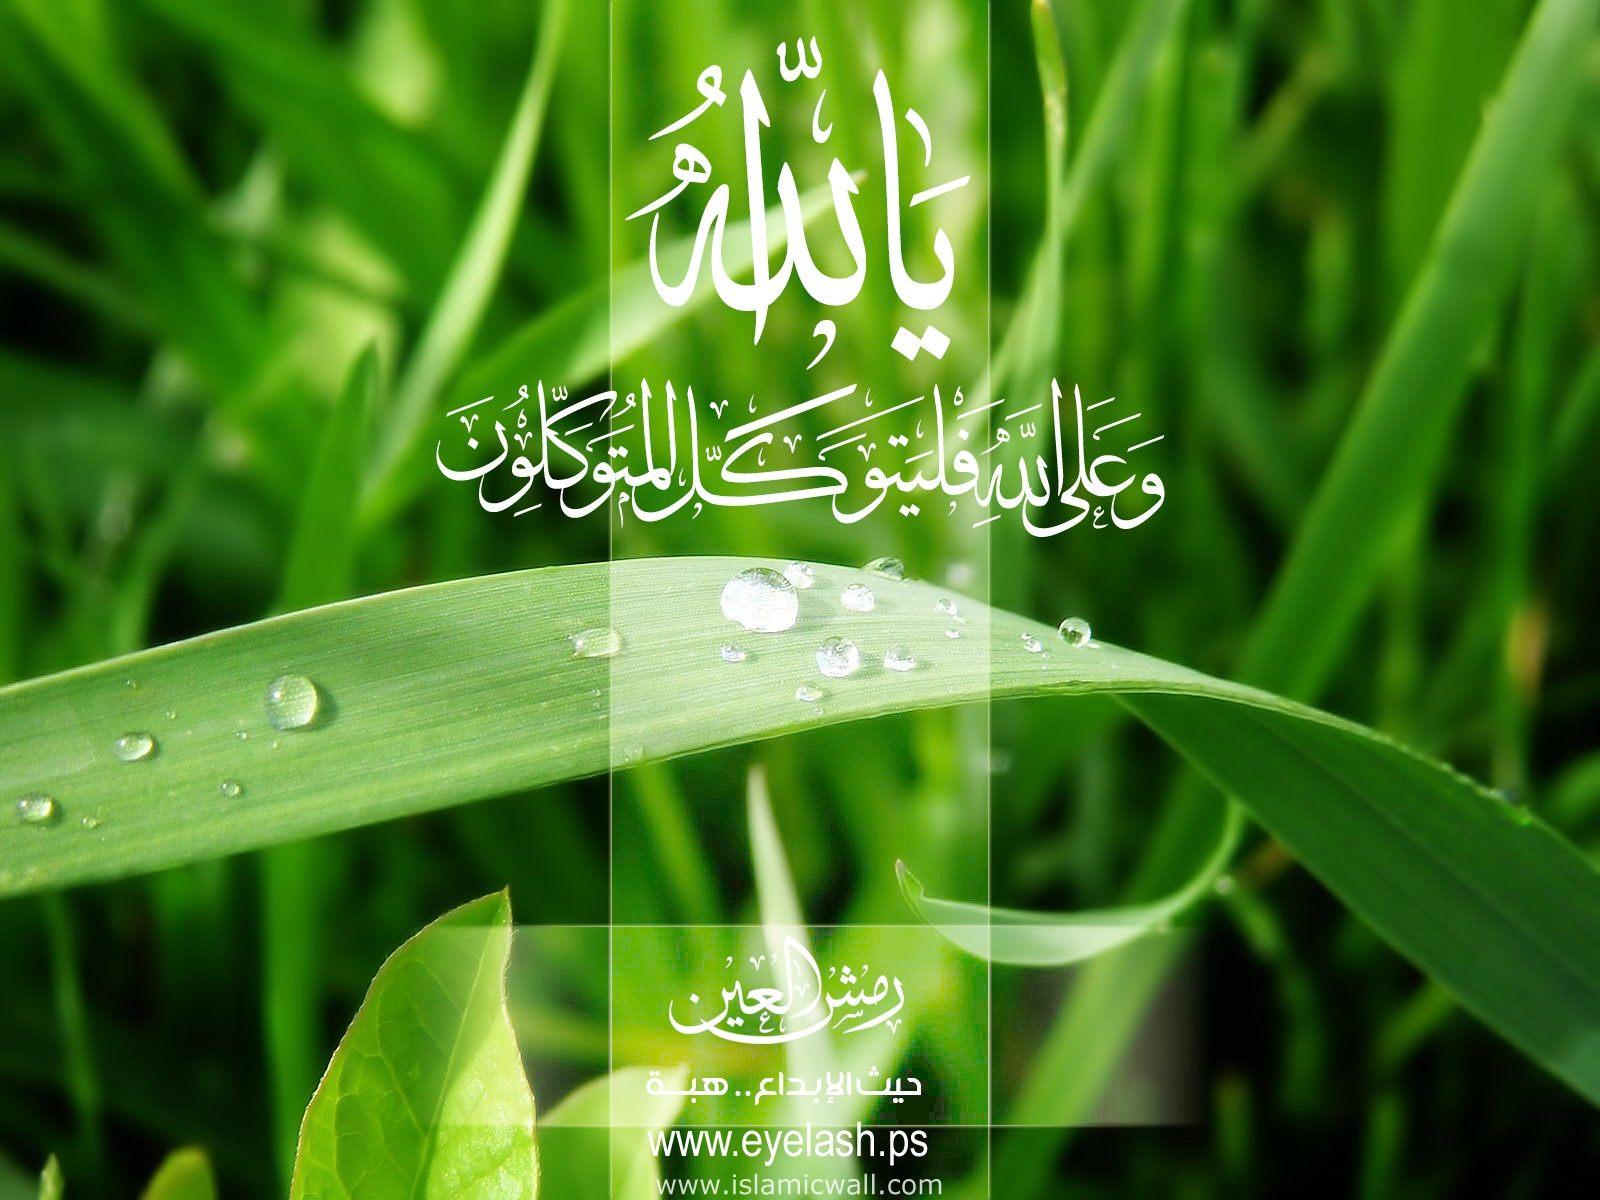 http://3.bp.blogspot.com/-vBNbx_quBn8/Tl-AKExZzrI/AAAAAAAABAA/AHg6gZbDwbM/s1600/Yeh_Allah.jpg